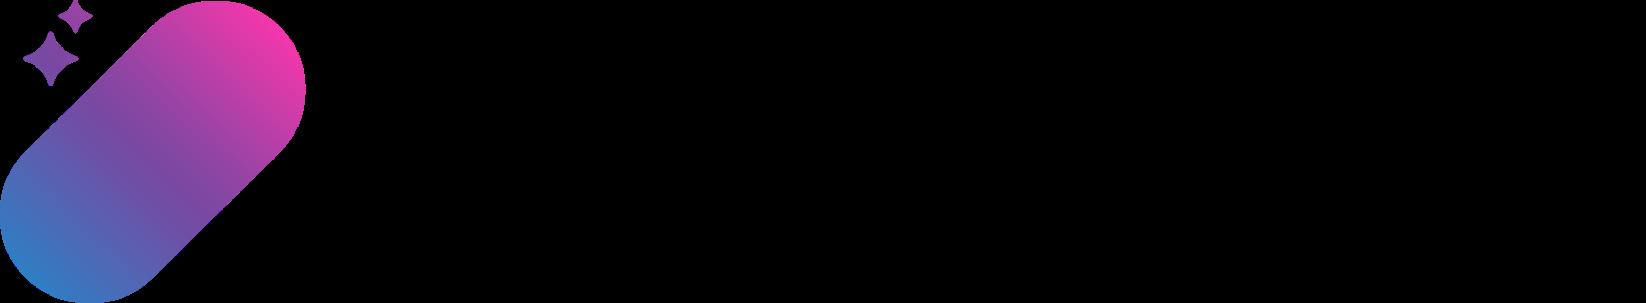 logo-koober-1.png